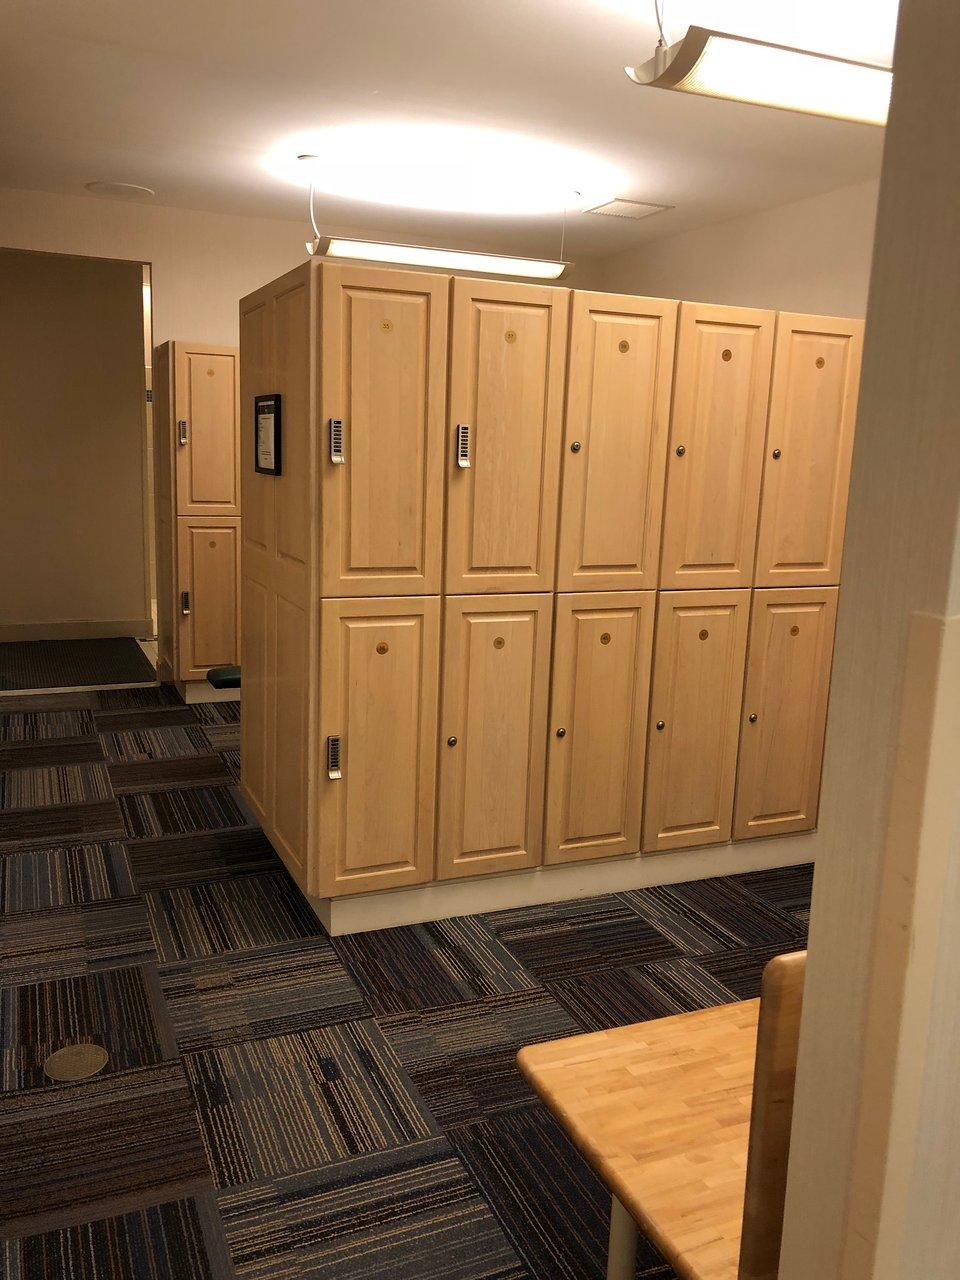 HILTON GARDEN INN BOSTON LOGAN AIRPORT - UPDATED 2018 Hotel Reviews ...